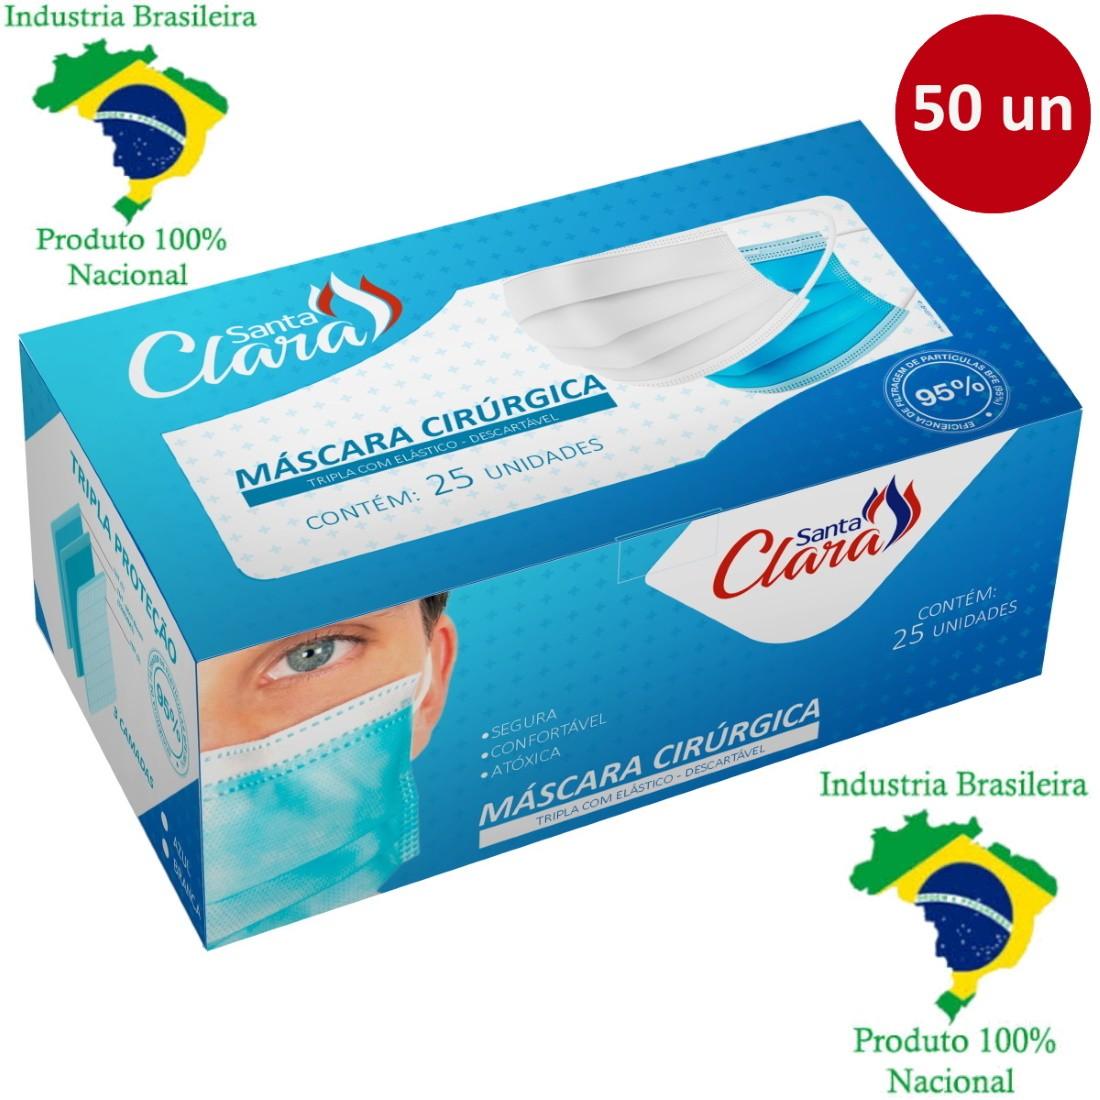 Máscara Cirúrgica Descartável TNT Tripla com Elástico Clipe Nasal e Anvisa 50 Un - Santa Clara